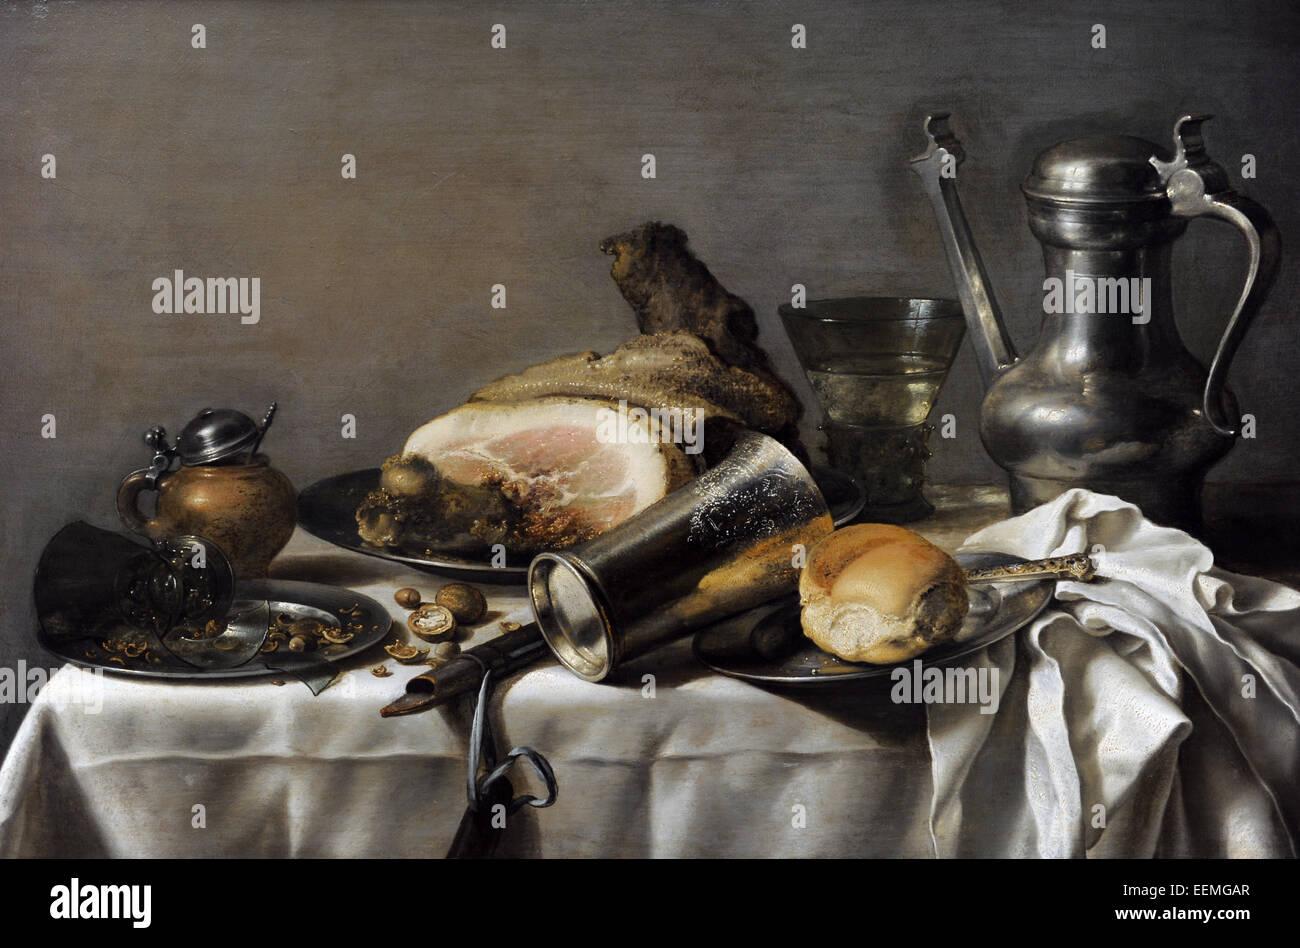 Pieter Claesz (1597-1660). La edad de oro holandesa pintor. Still life. Alte Pinakothek. Munich. Alemania. Imagen De Stock